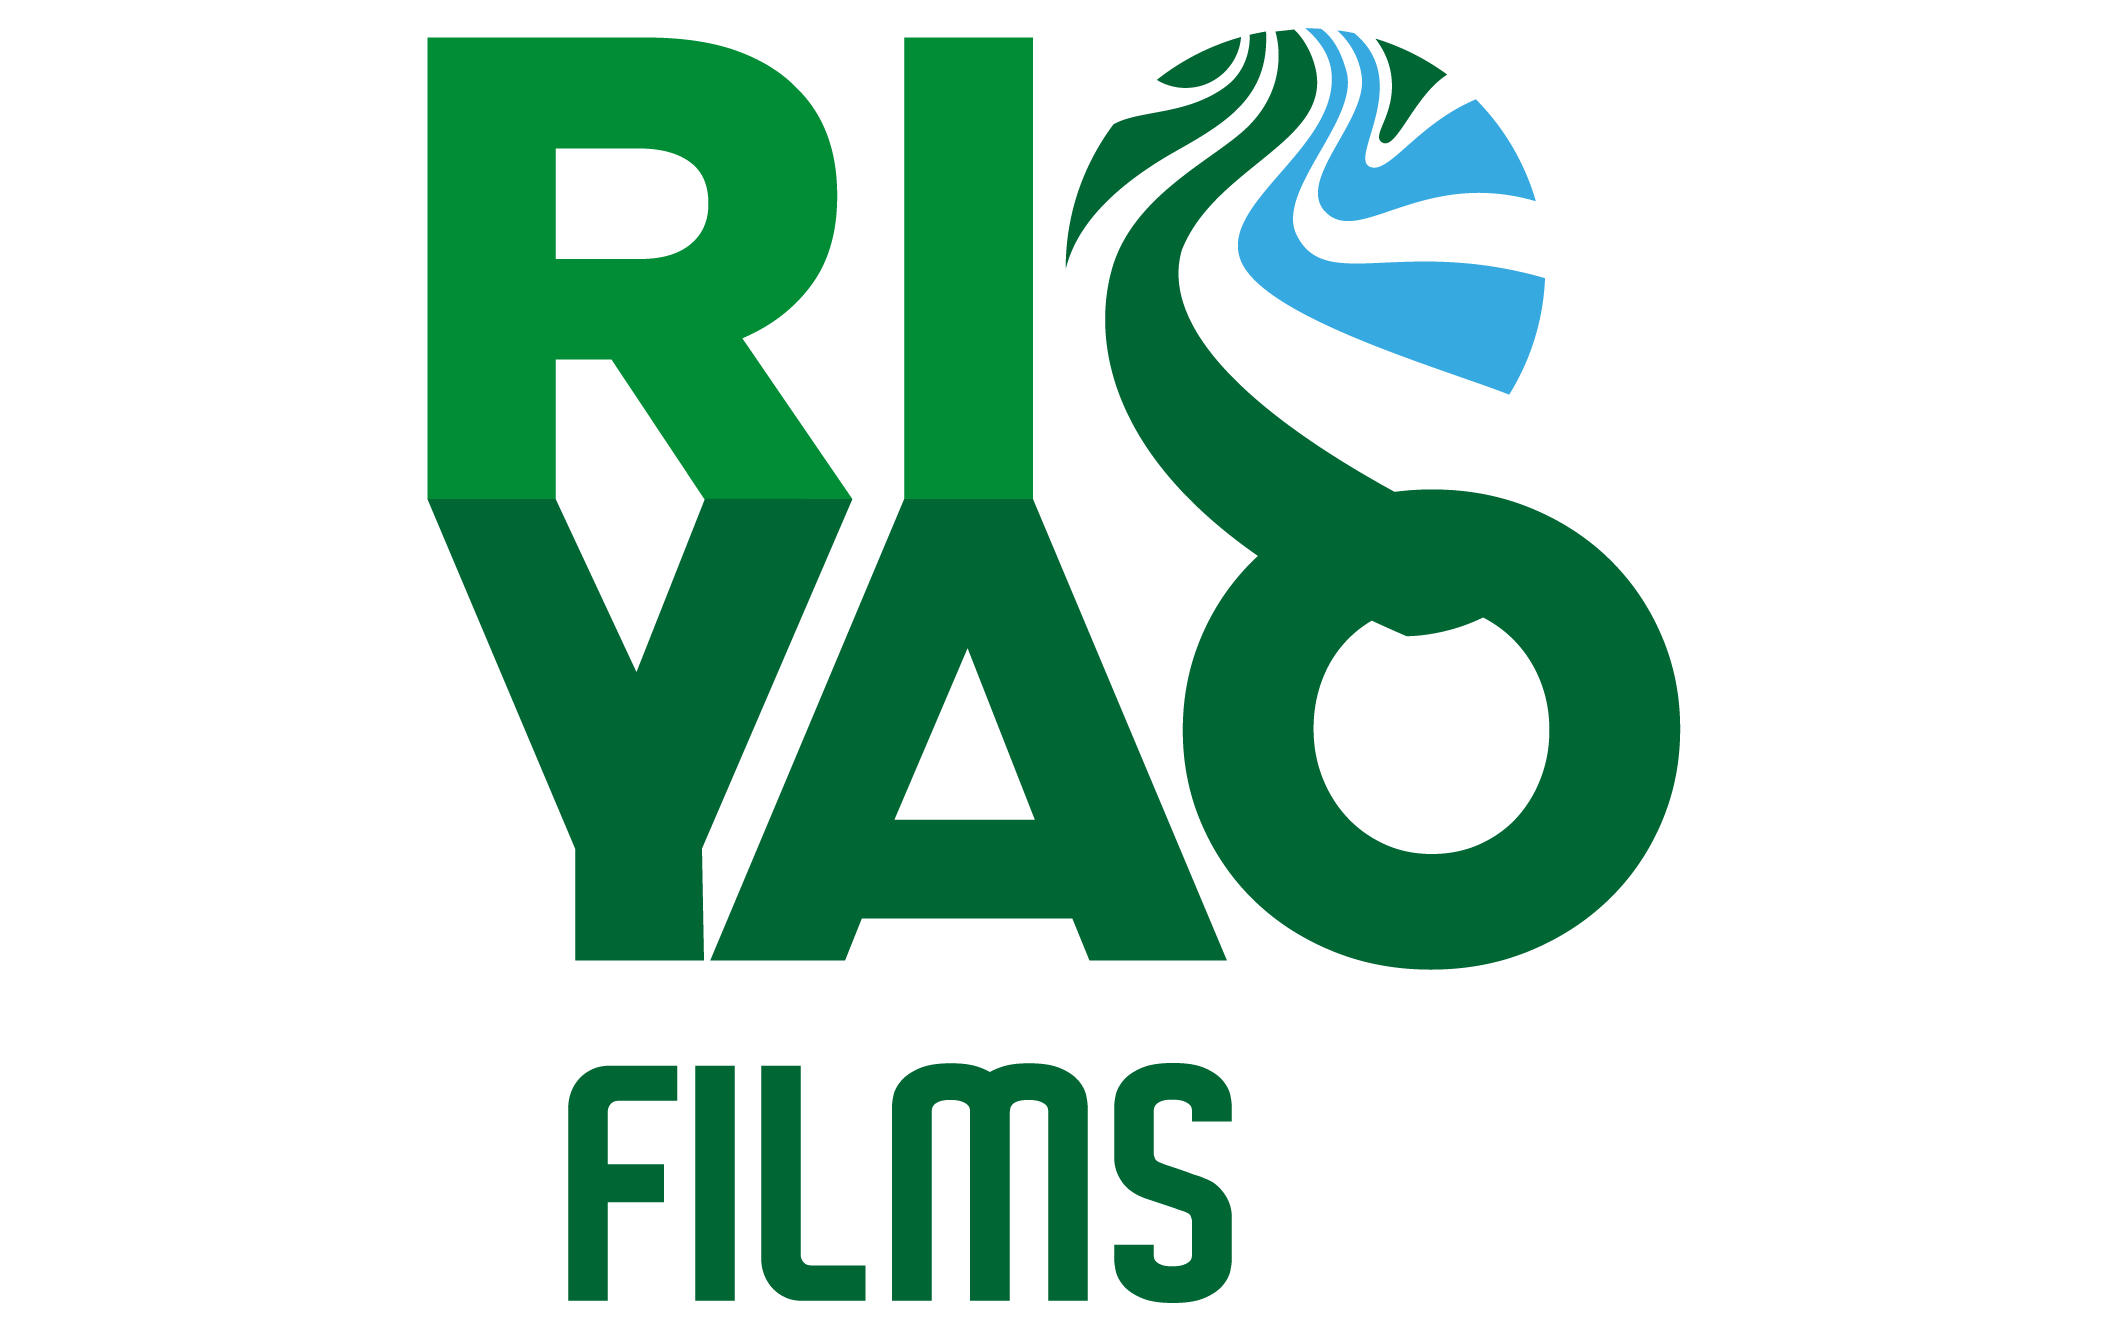 Rioyaofilms